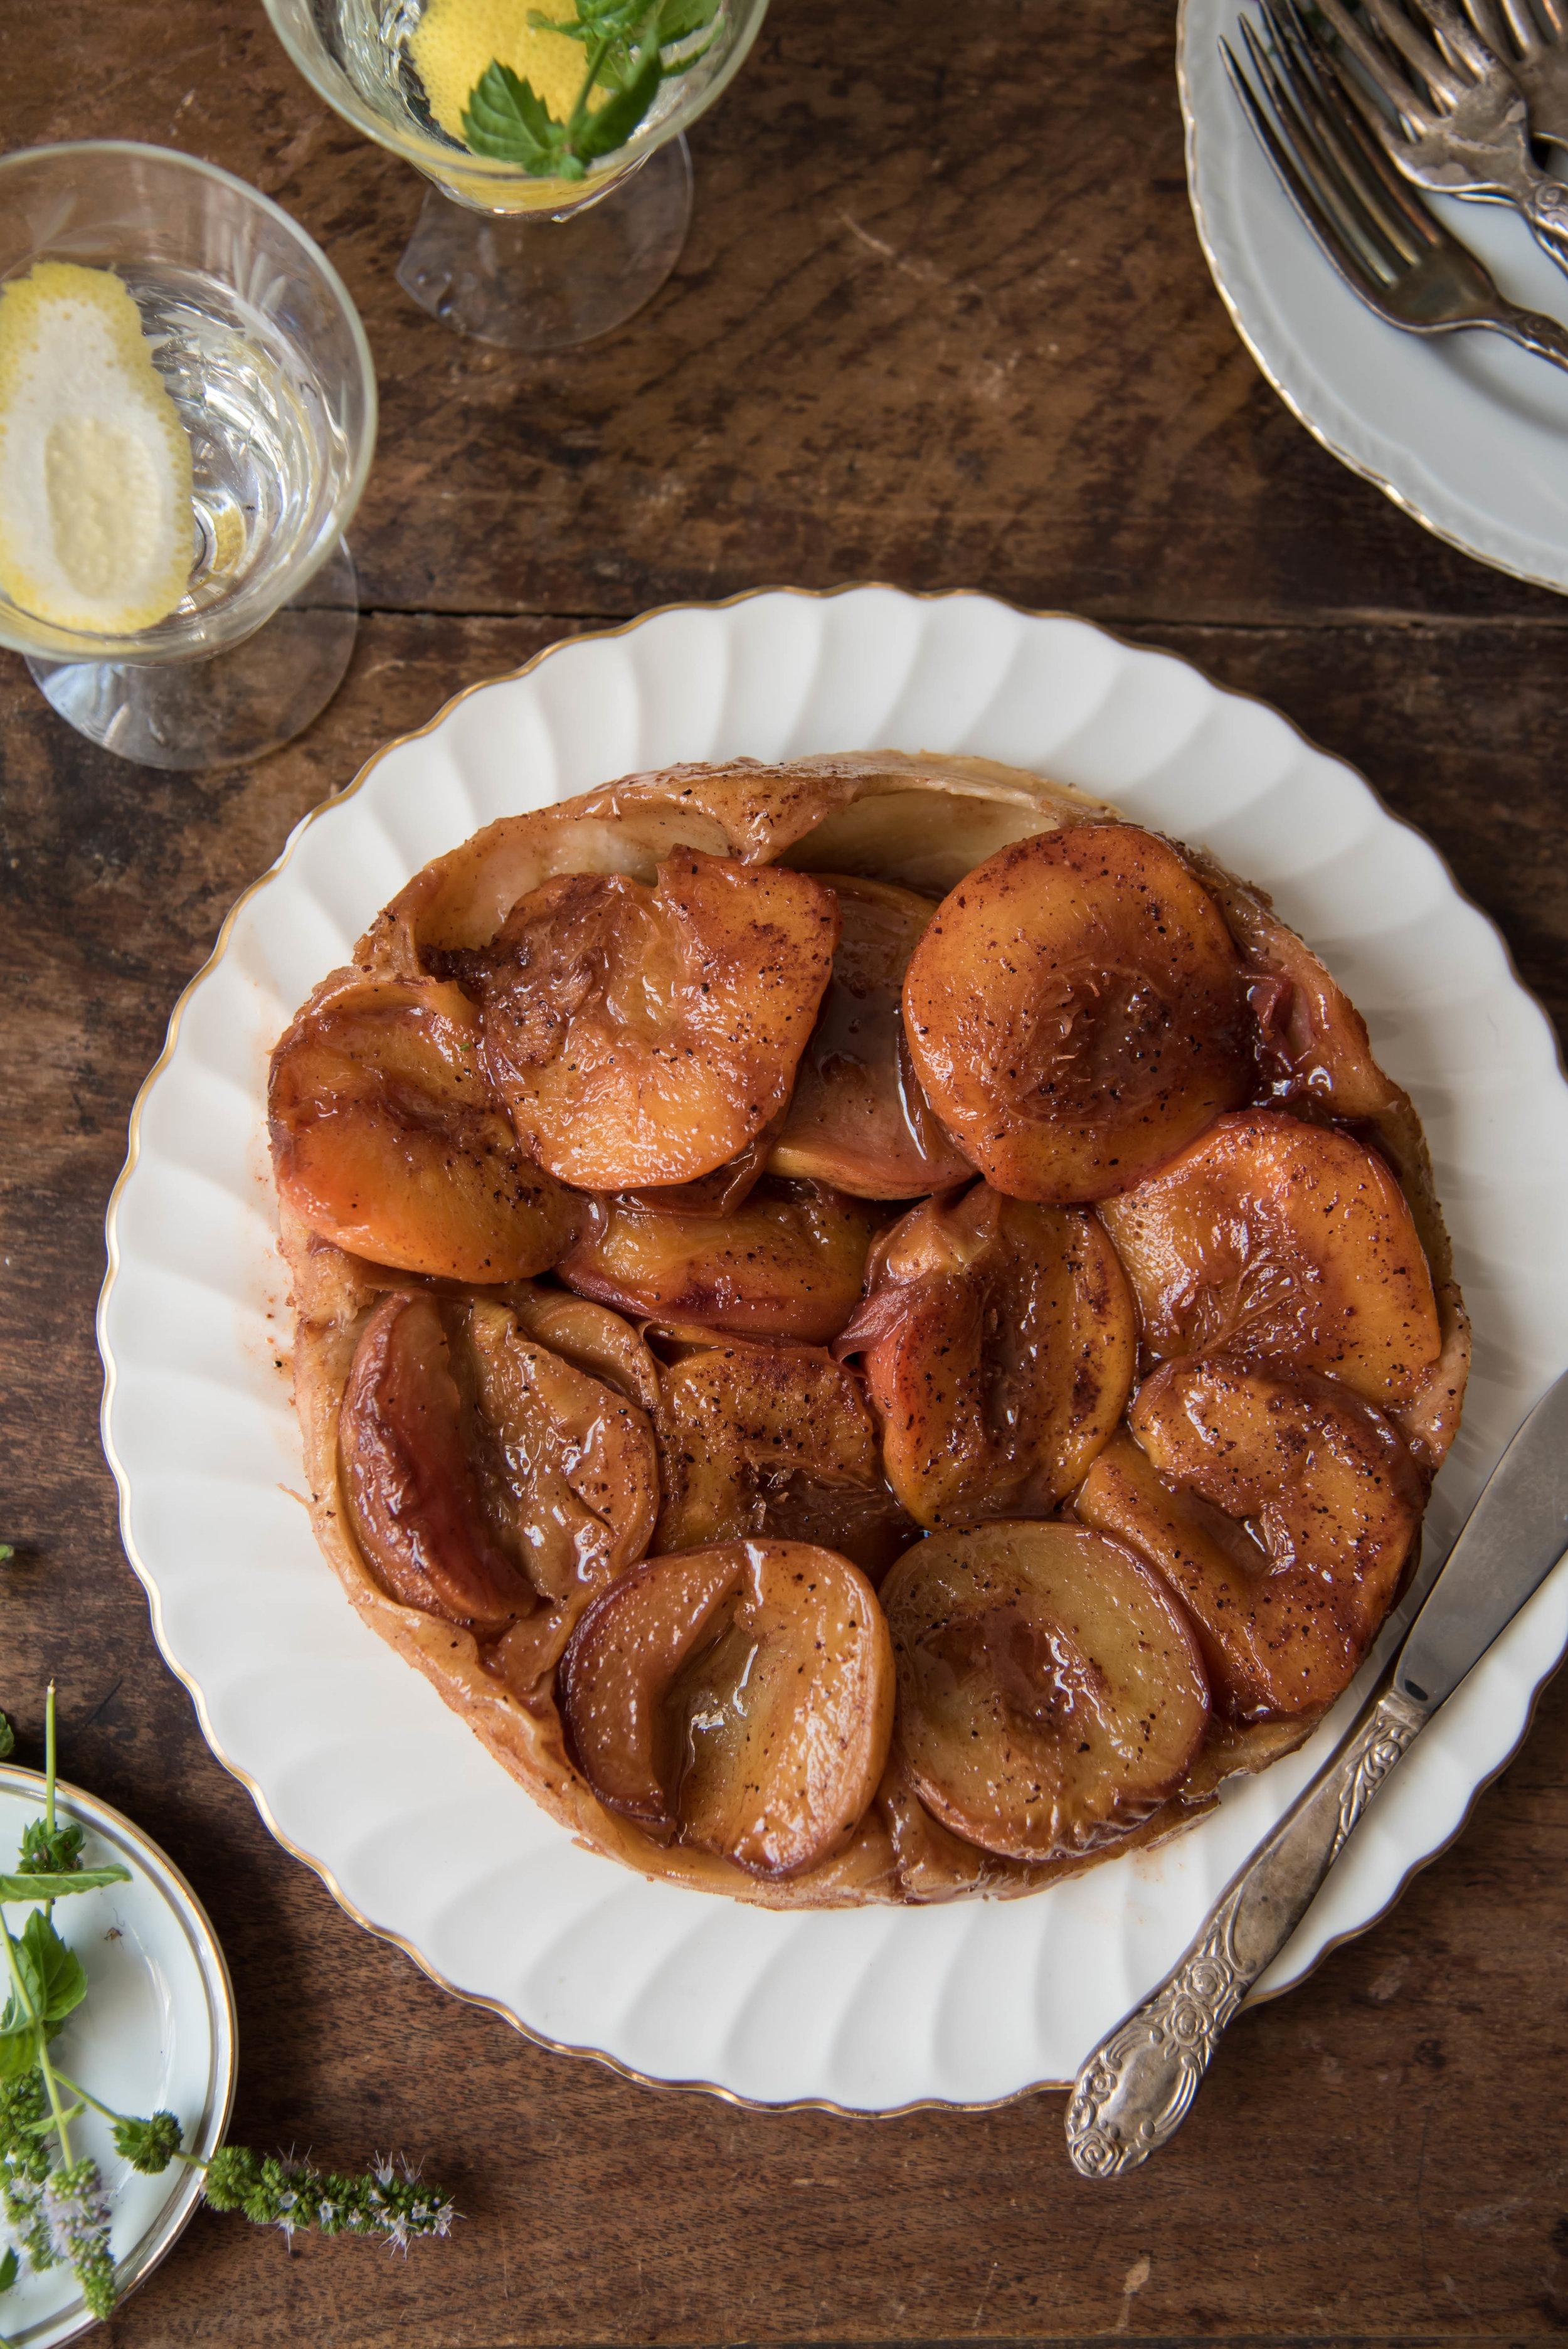 ROSE & IVY Journal Peach Picking & Peach Tart Tatin